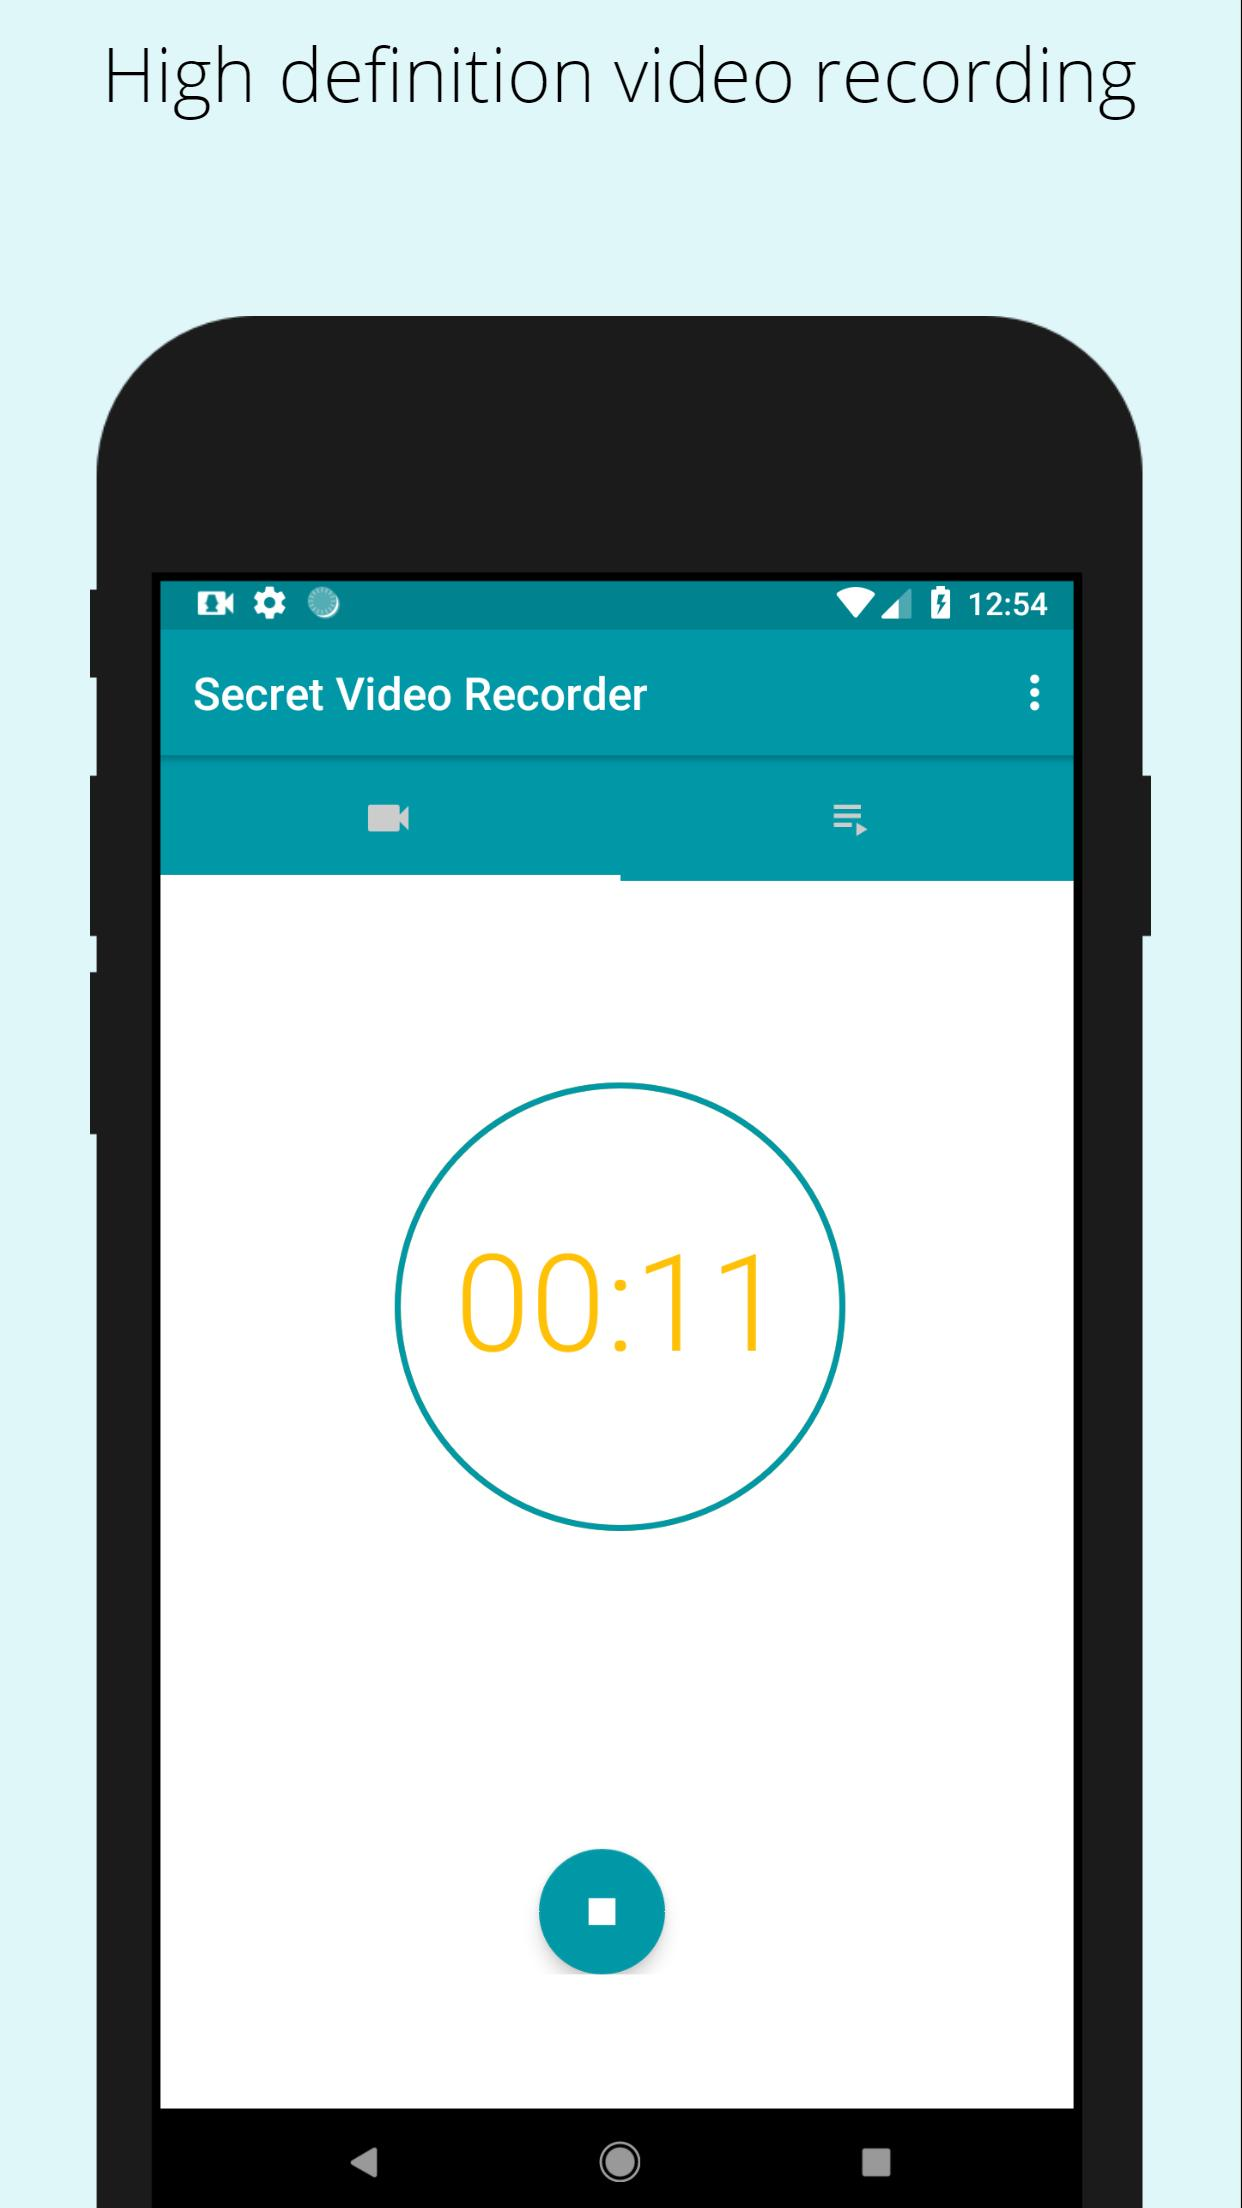 Secret Video Recorder (SVR) PRO v1.3.4.10 Cracked APK 2